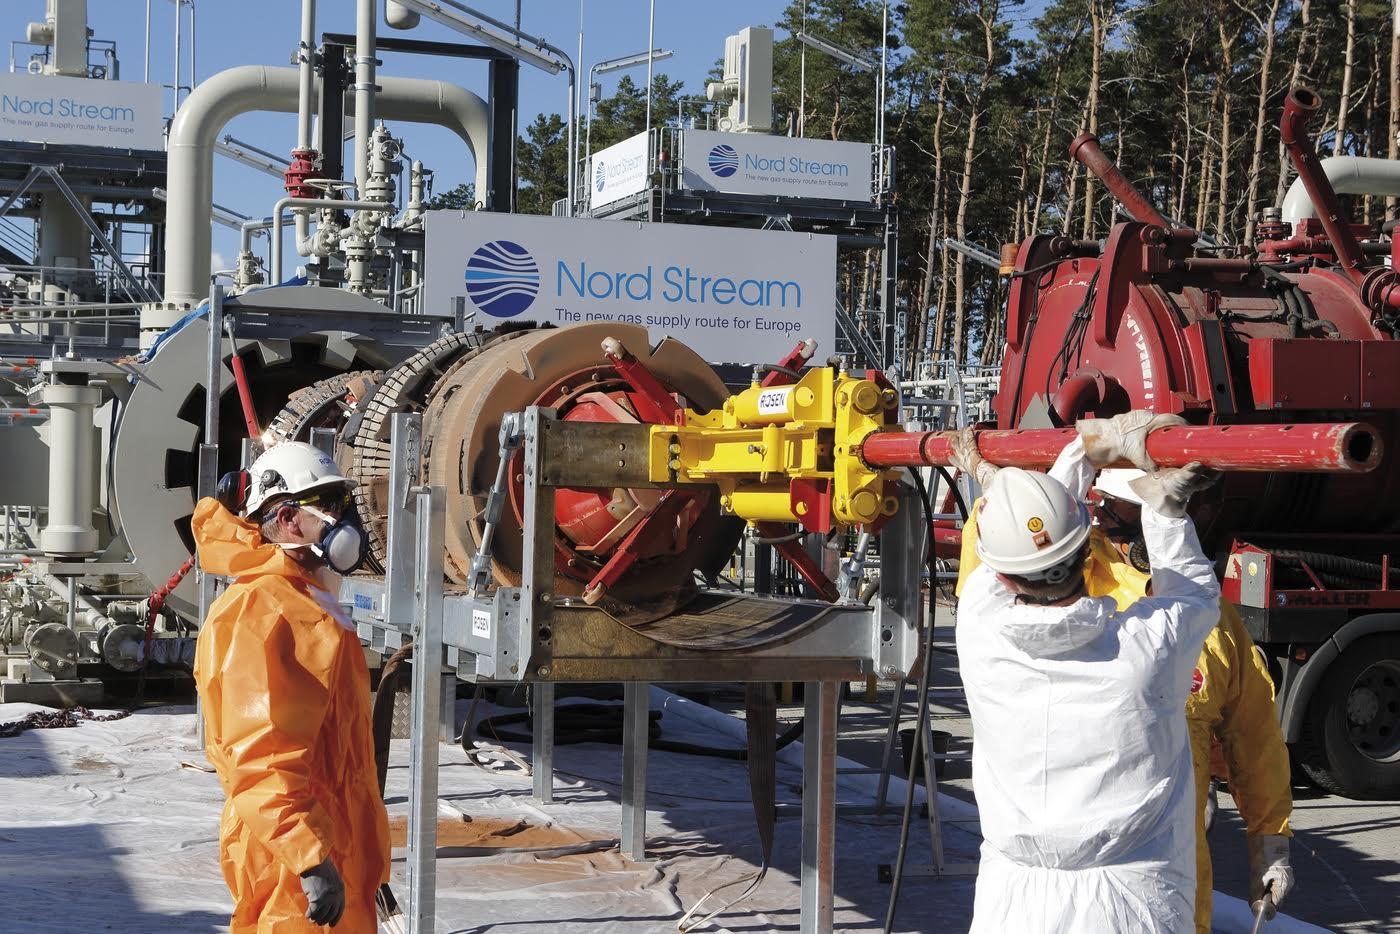 Nord Stream ΙΙ vs US shale gas: Όταν η Ουάσινγκτον προκαλεί την Ε.Ε.